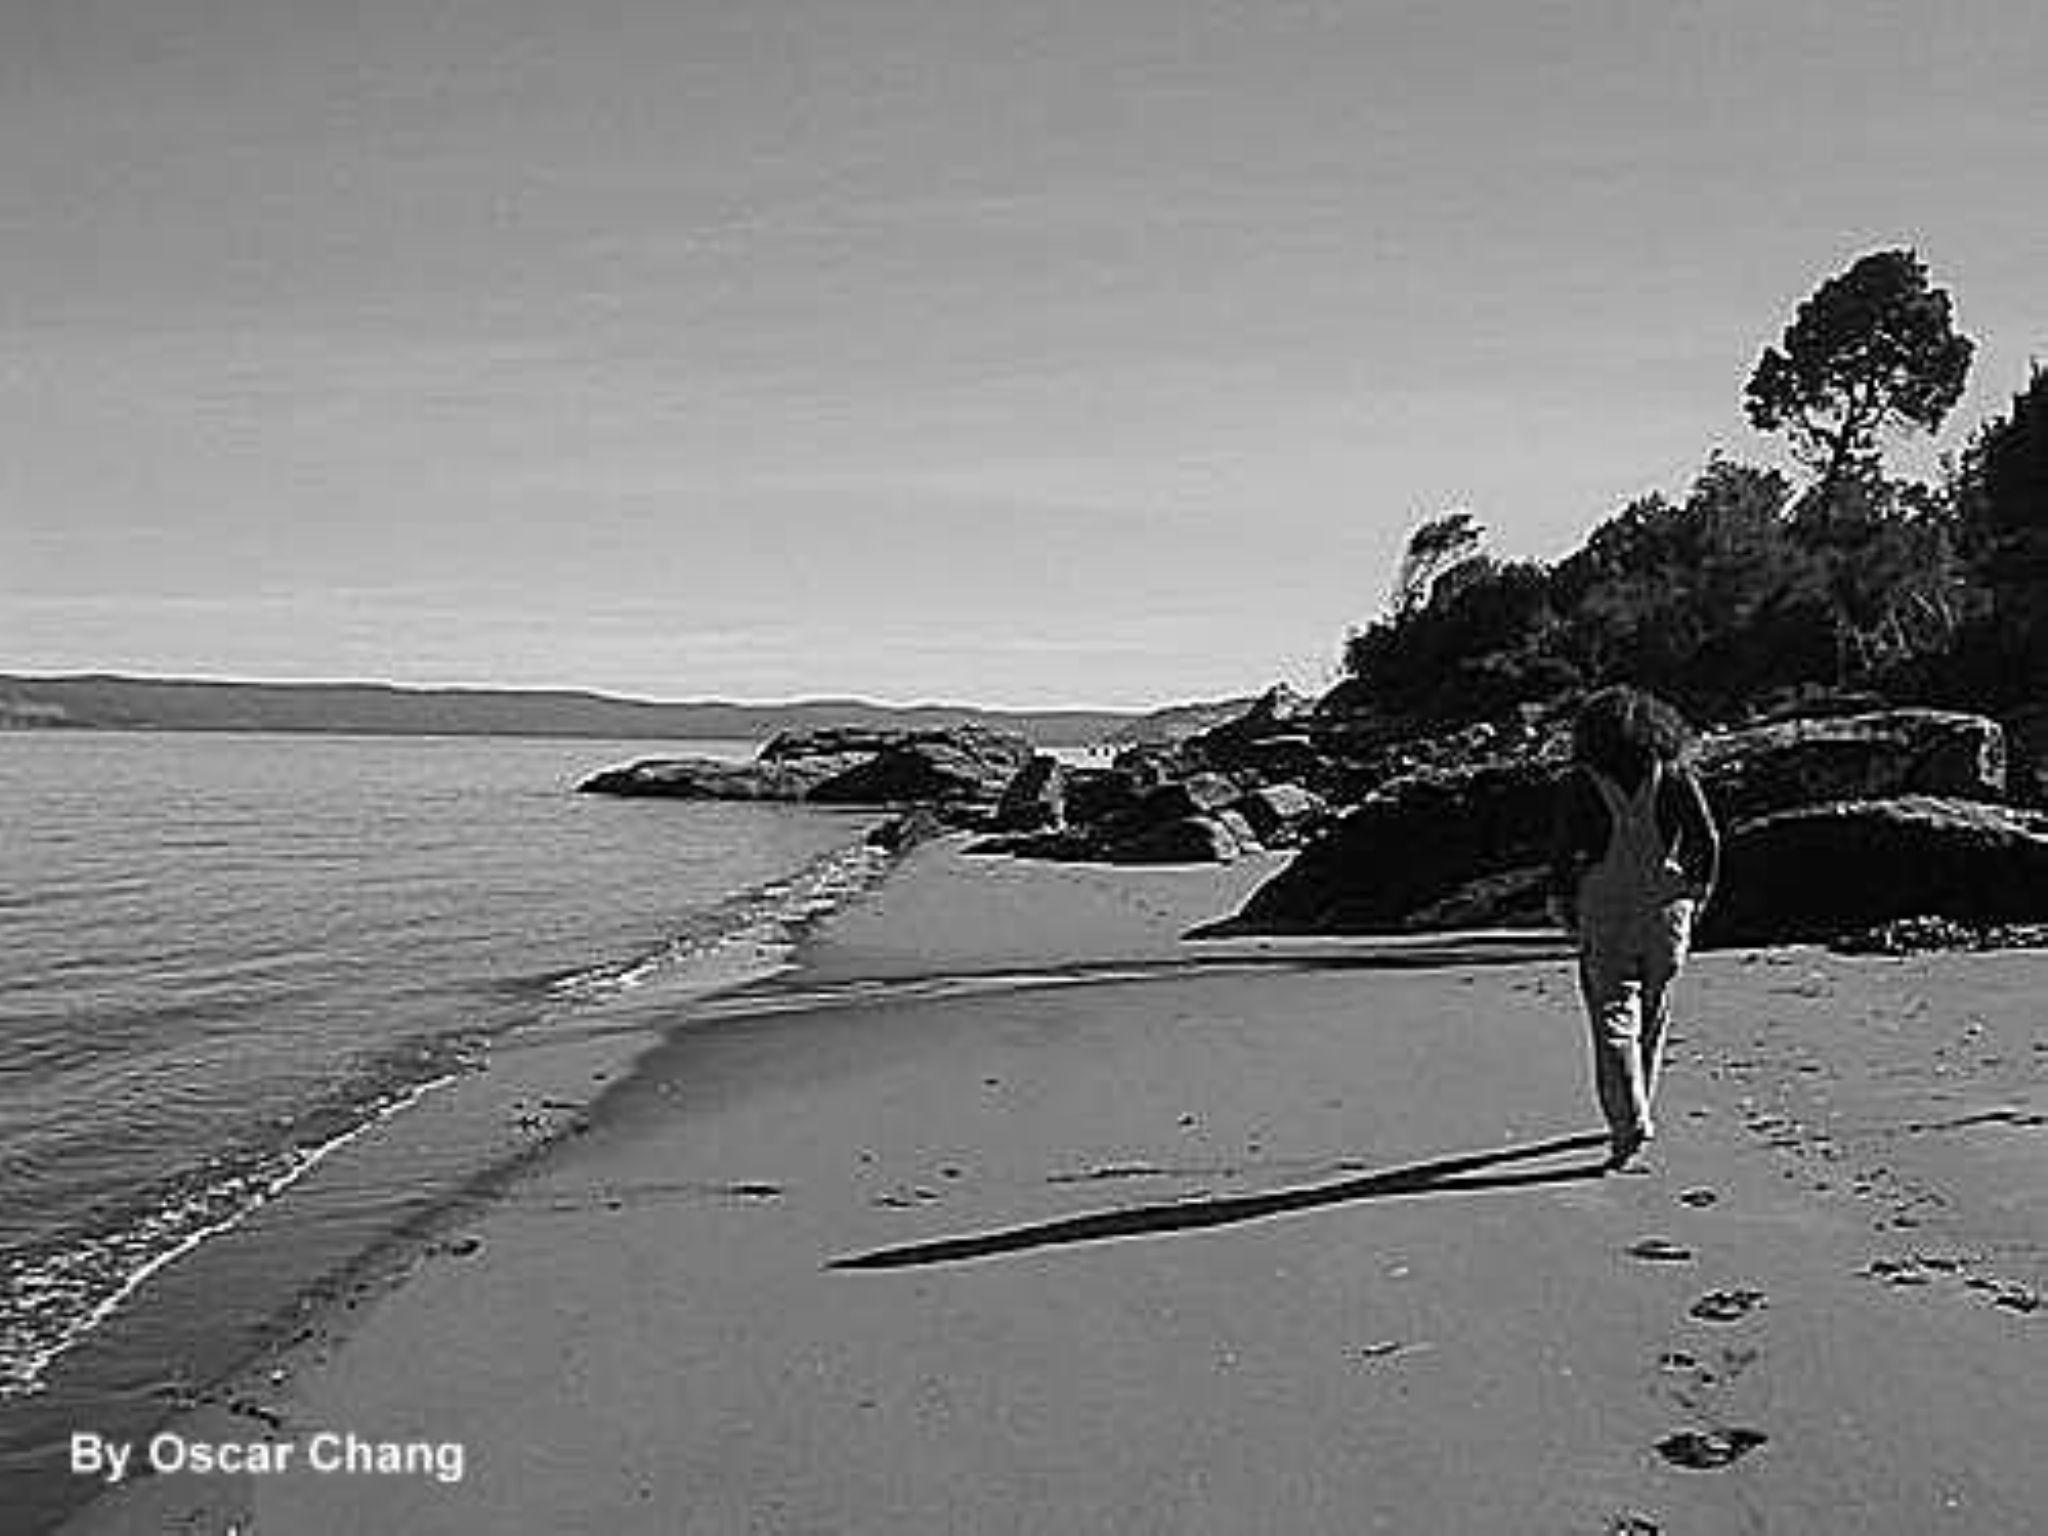 Playa de Laitec by Oscar Chang